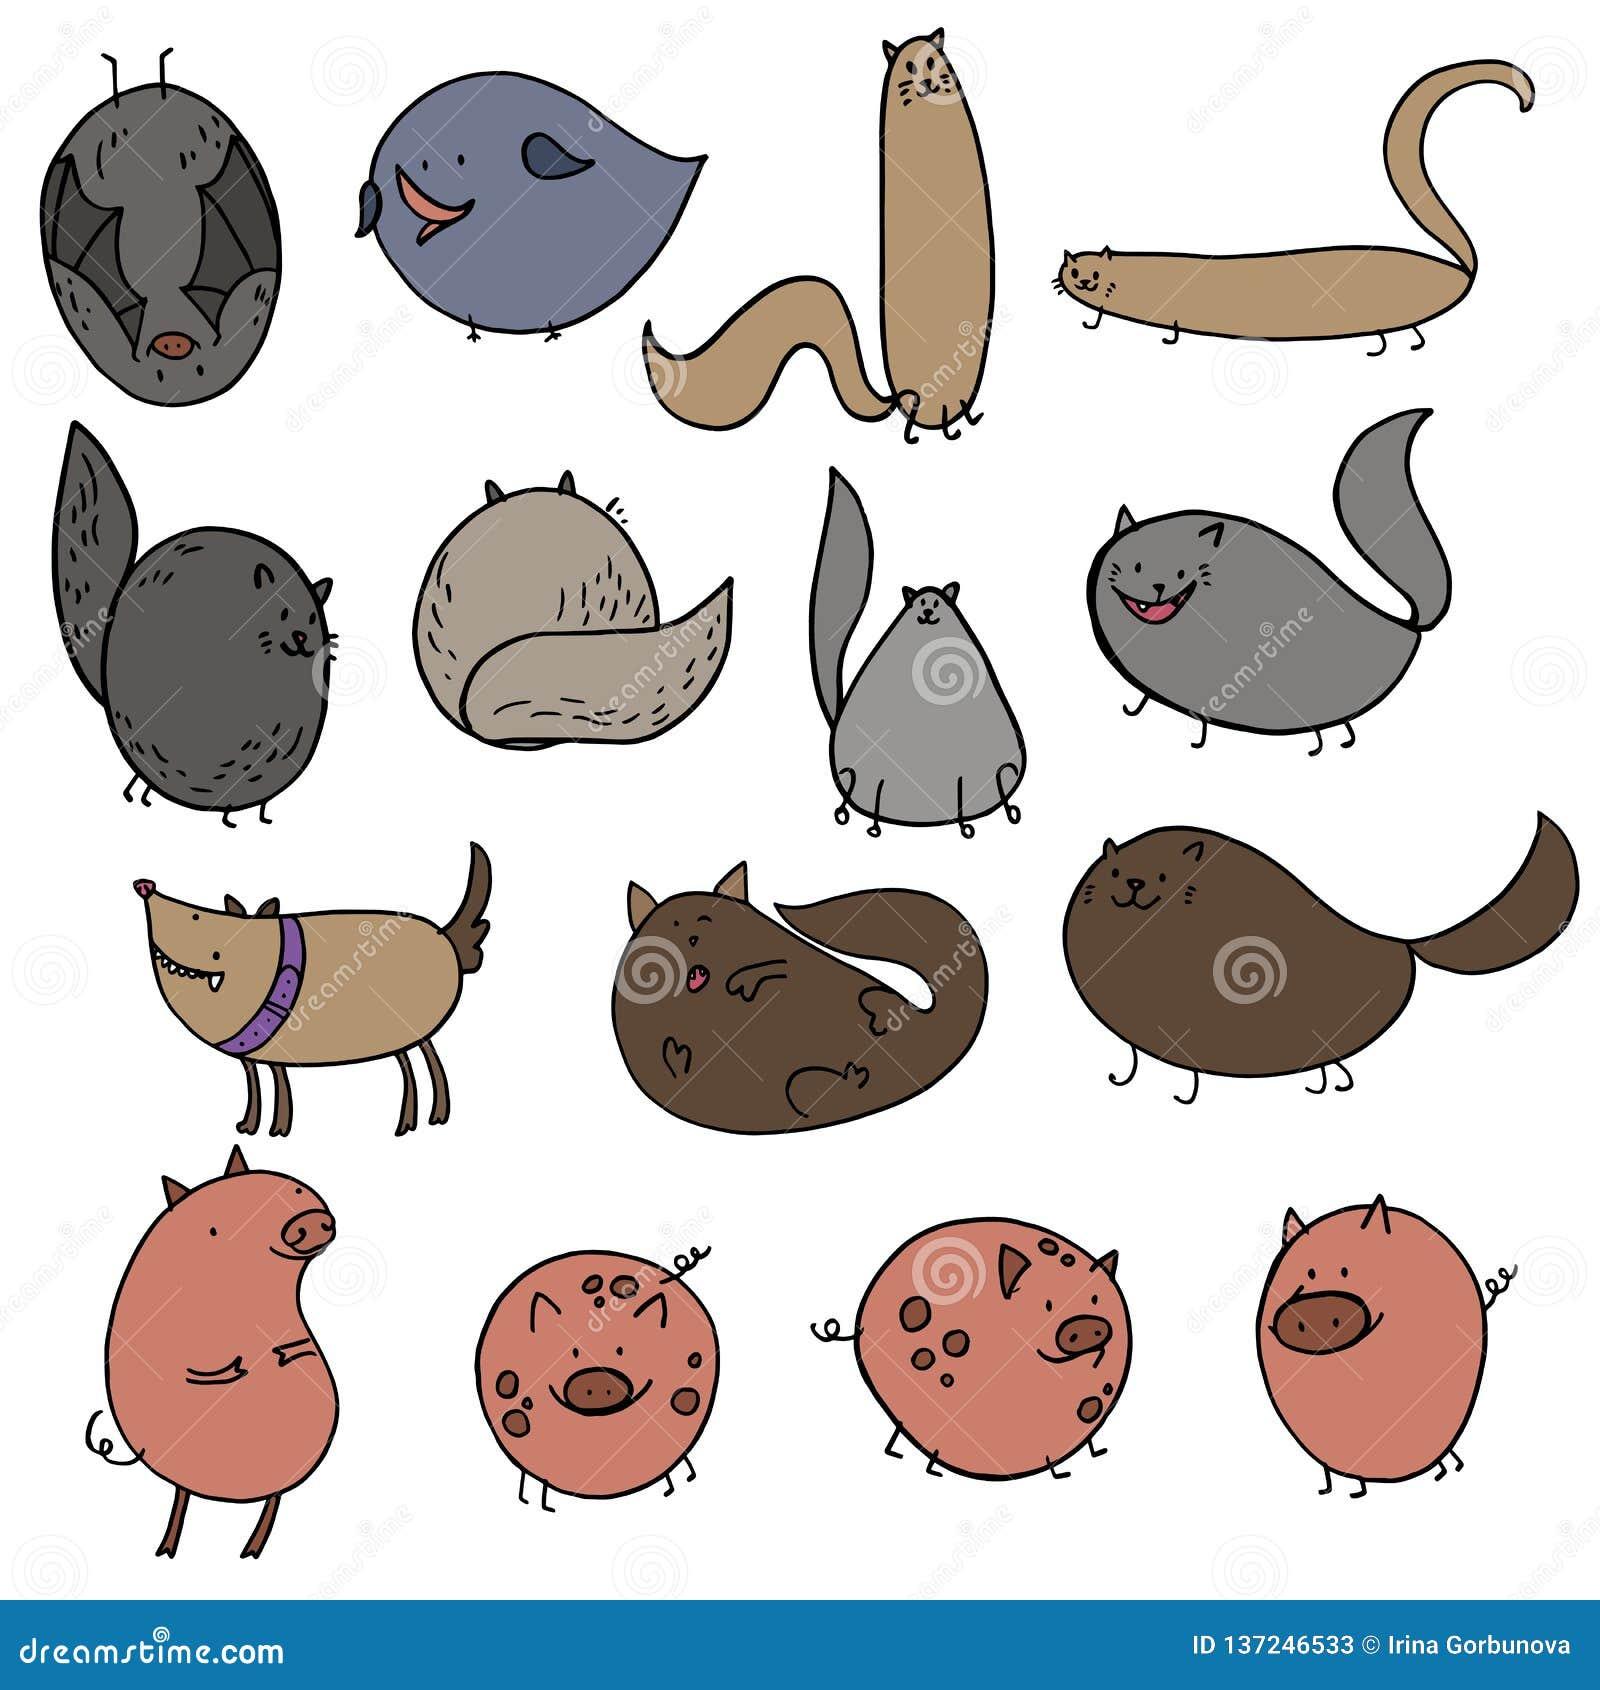 Doodles Vector Illustration Of Cartoon Cat Dog Pig Bat Bird Stock